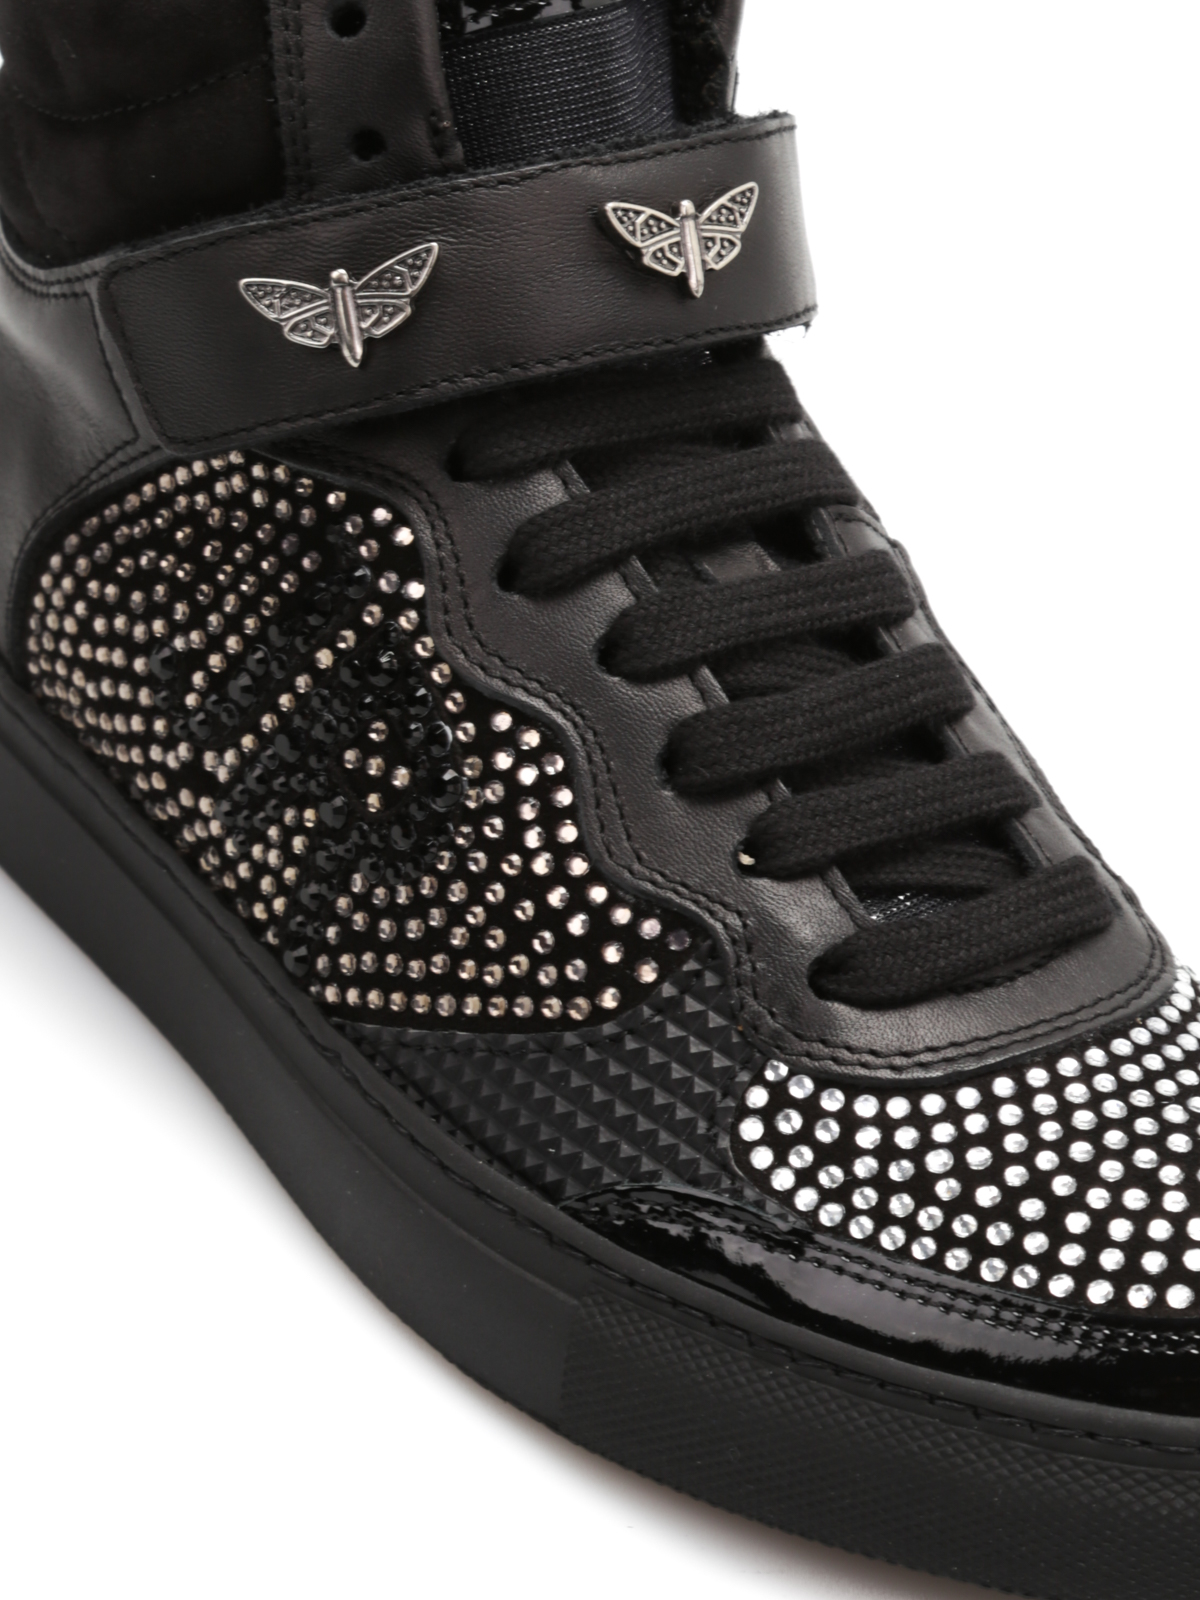 John Richmond Shoes - Fuzzbeed HD Gallery